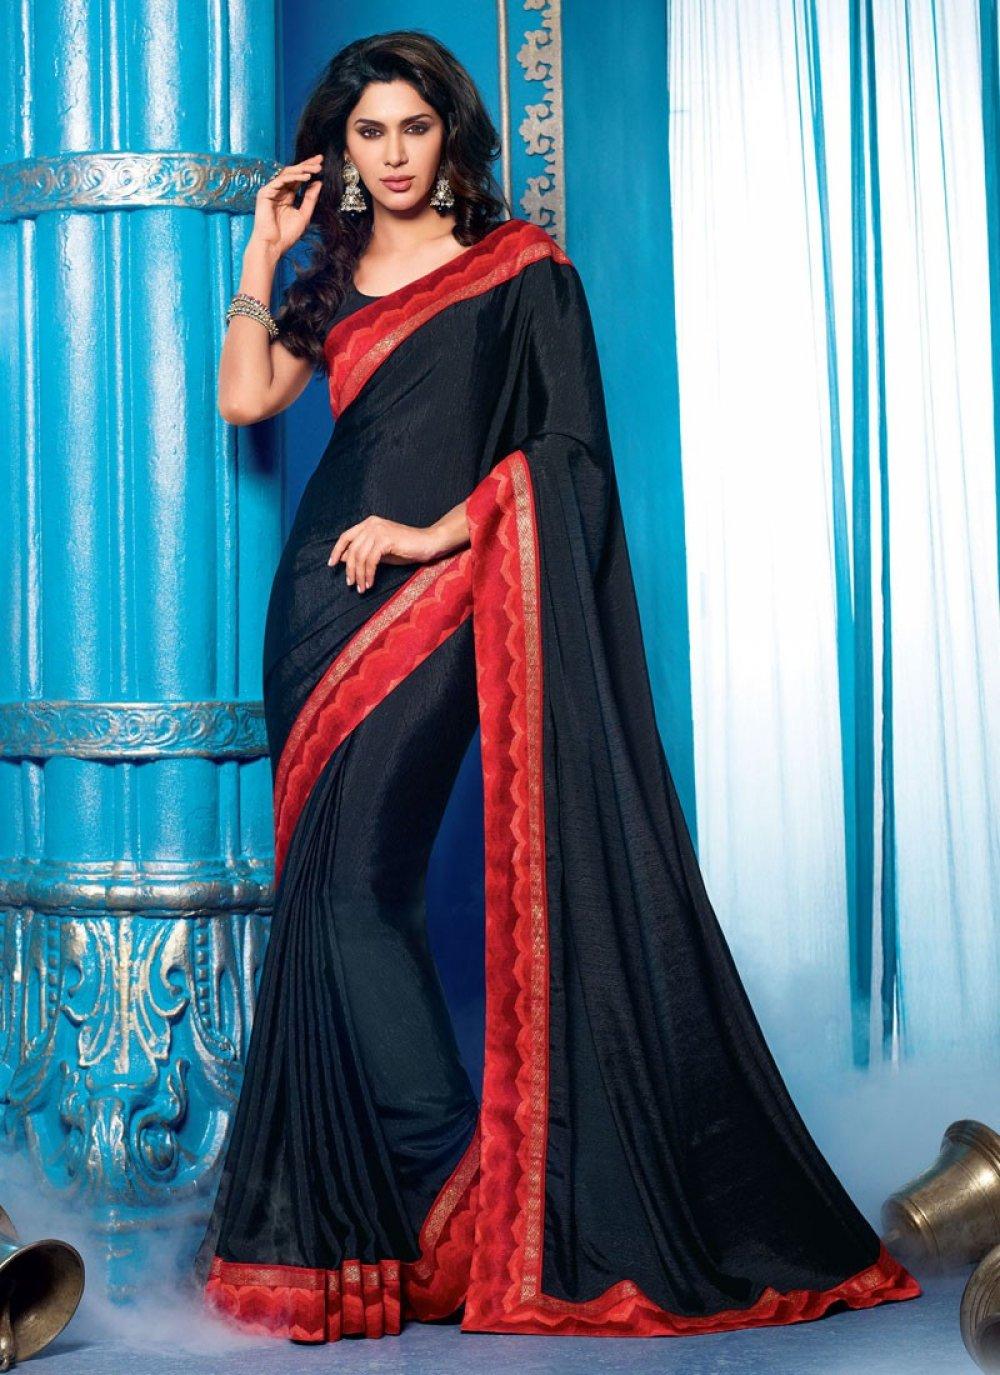 Black Art Silk Lingaa Movie Style Saree